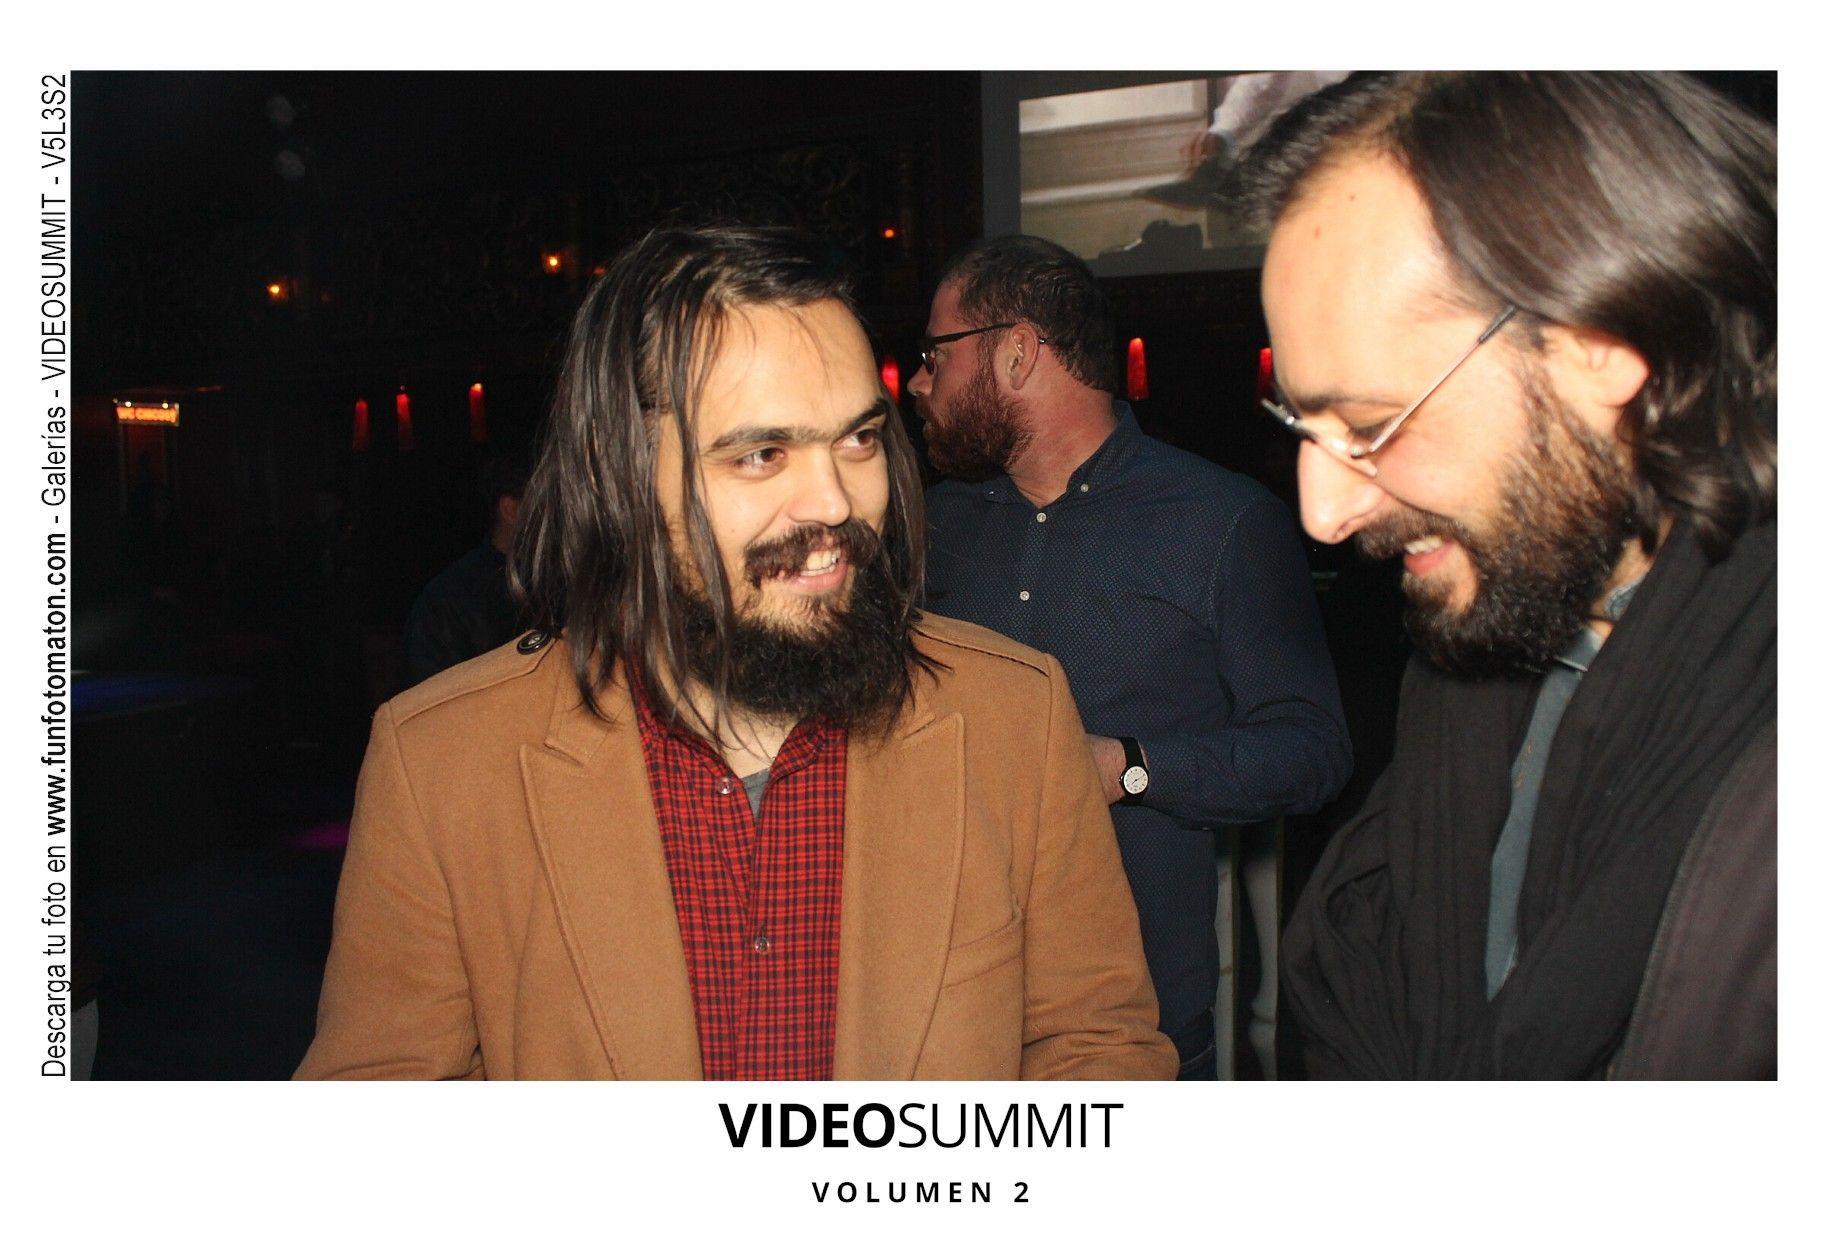 videosummit-vol2-club-party-003